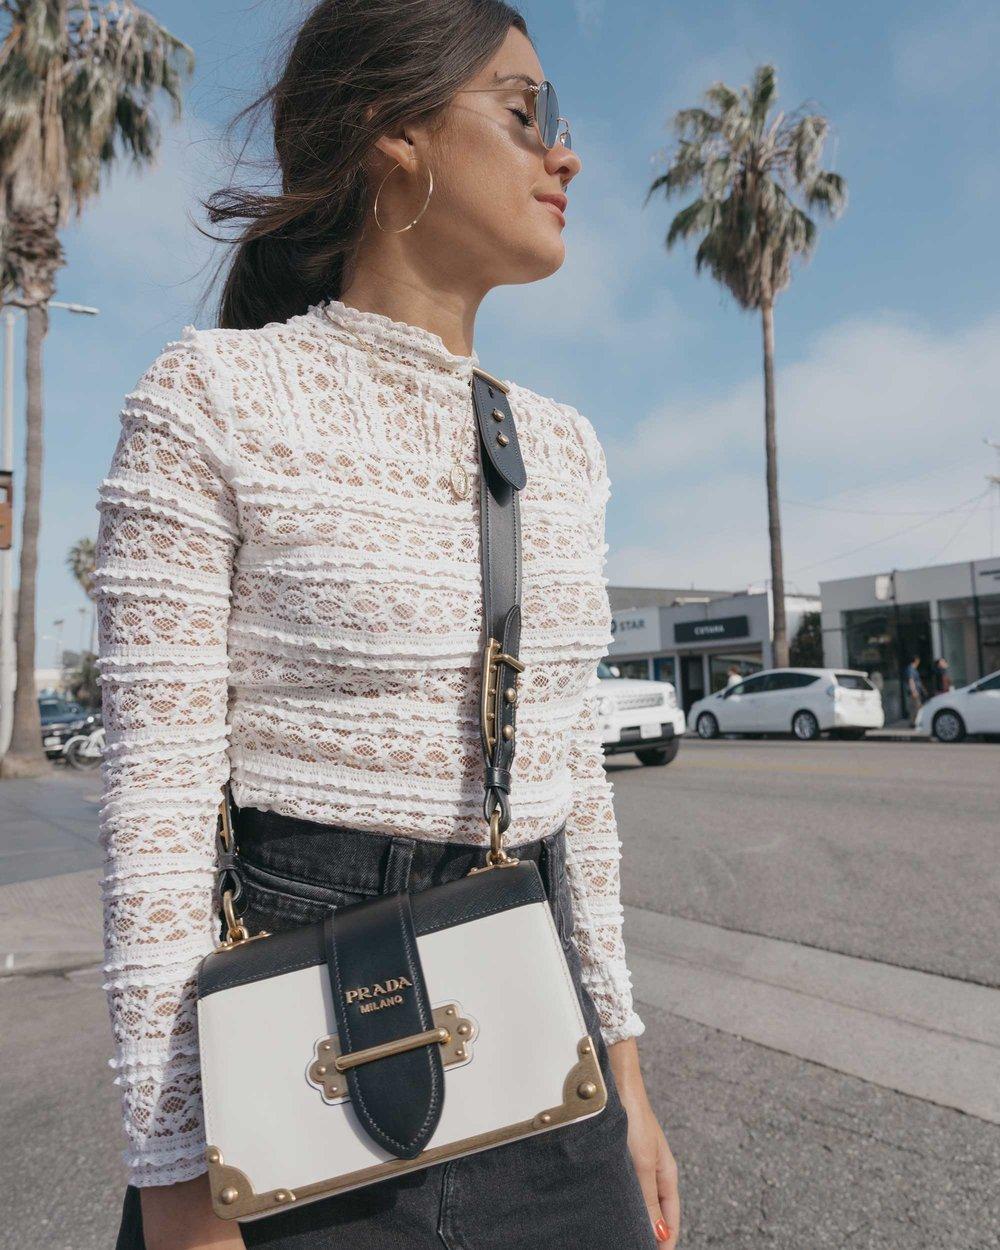 Prada City Saffiano Leather Cahier Bag, Black Denim Skirt, Summer outfit, Abbot Kinney California9.jpg